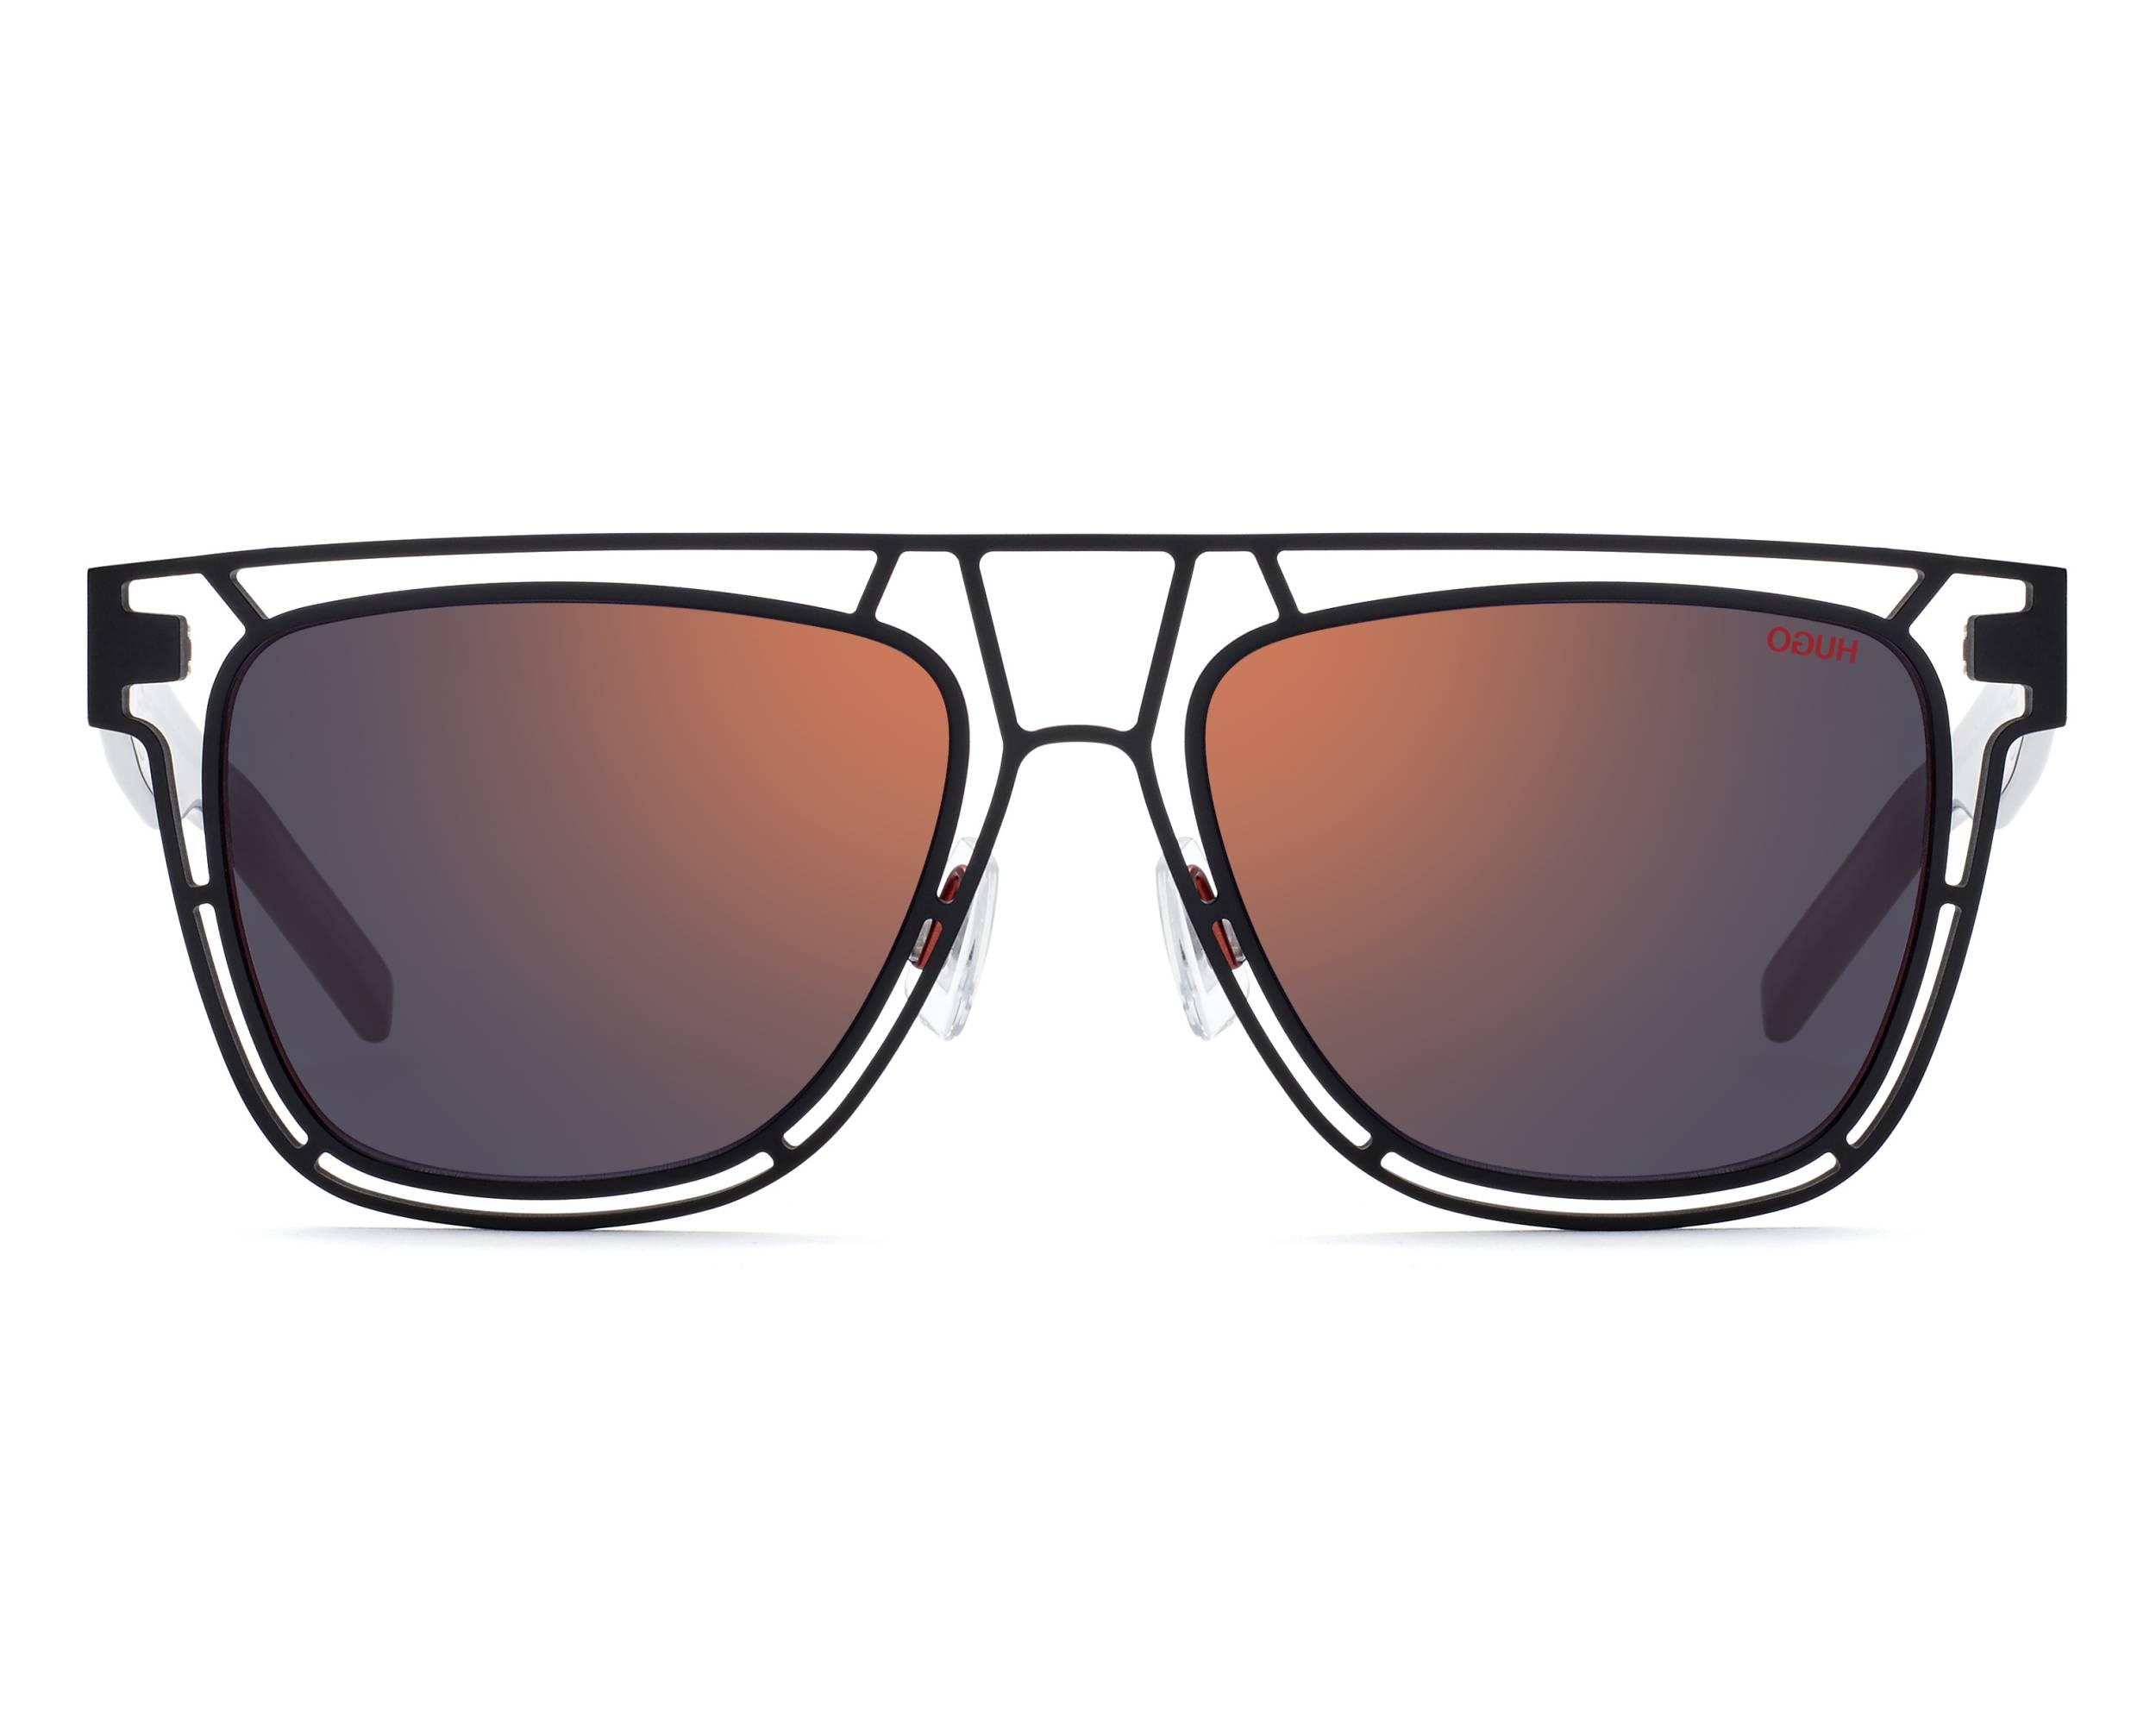 363bc5ee9bea Sunglasses Hugo Boss HG-1020-S BLXAO 55-17 Black Grey side view